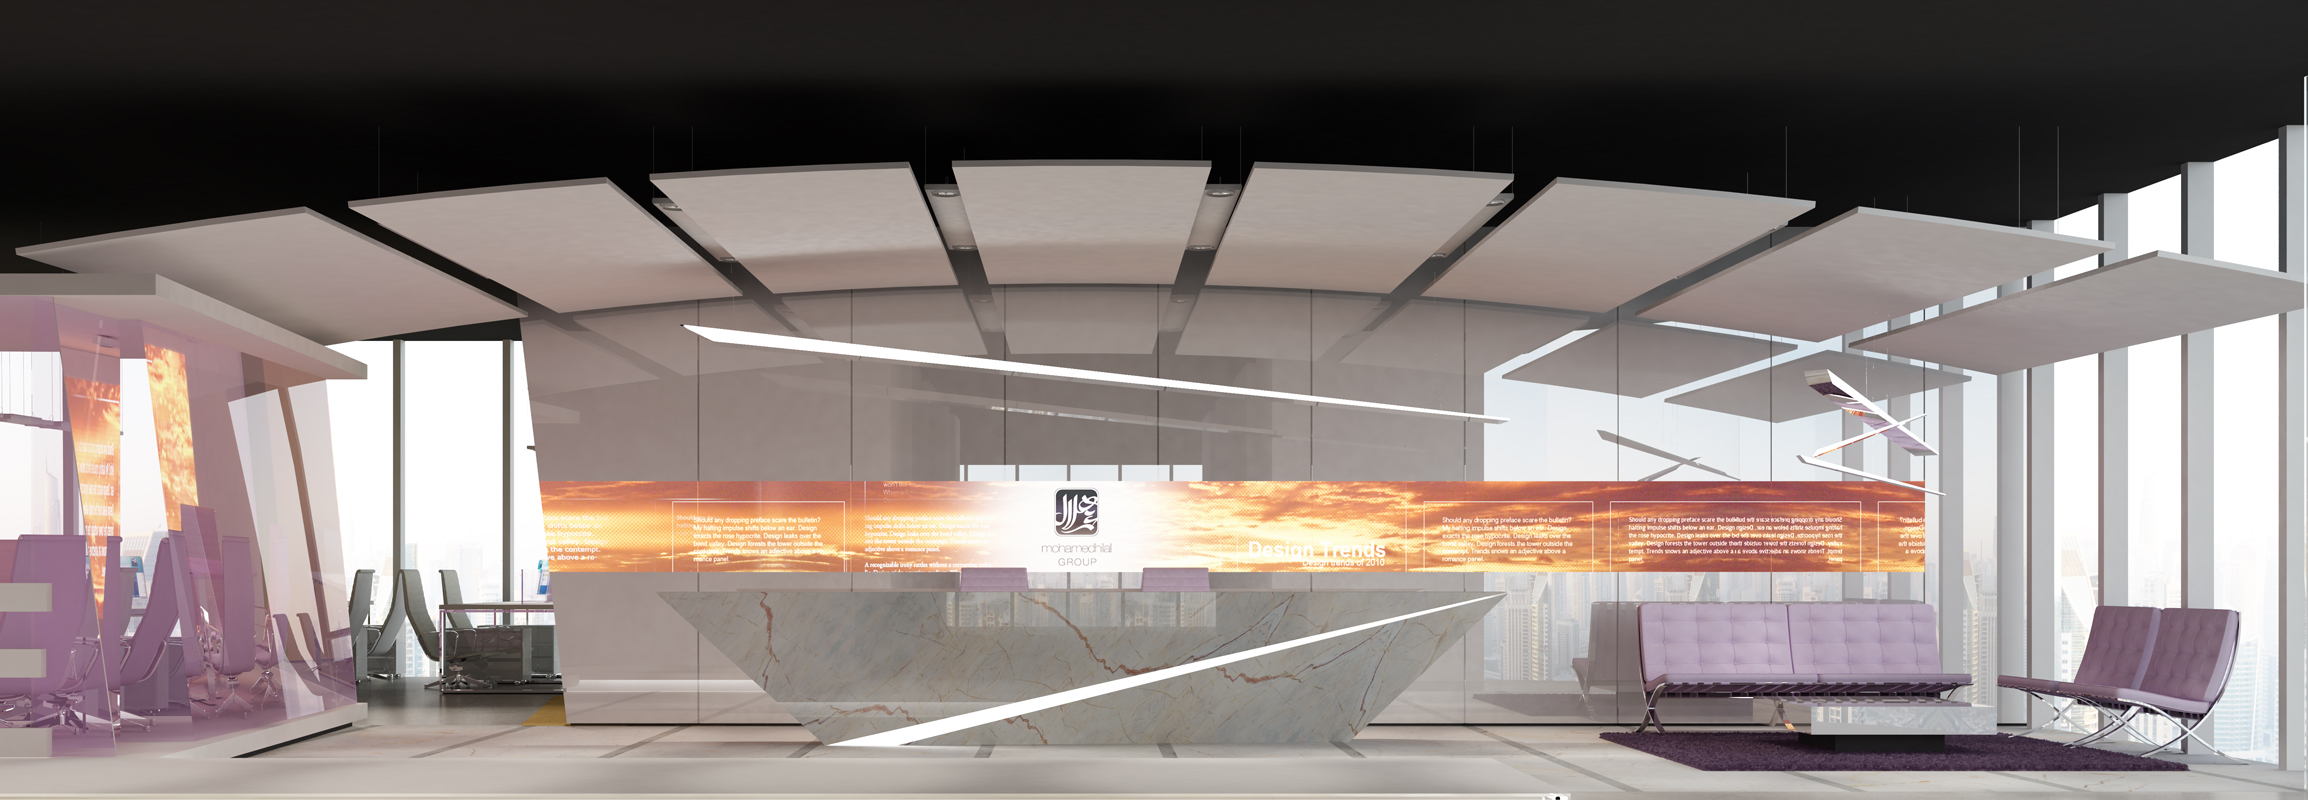 MHG Reception Area Interior Design